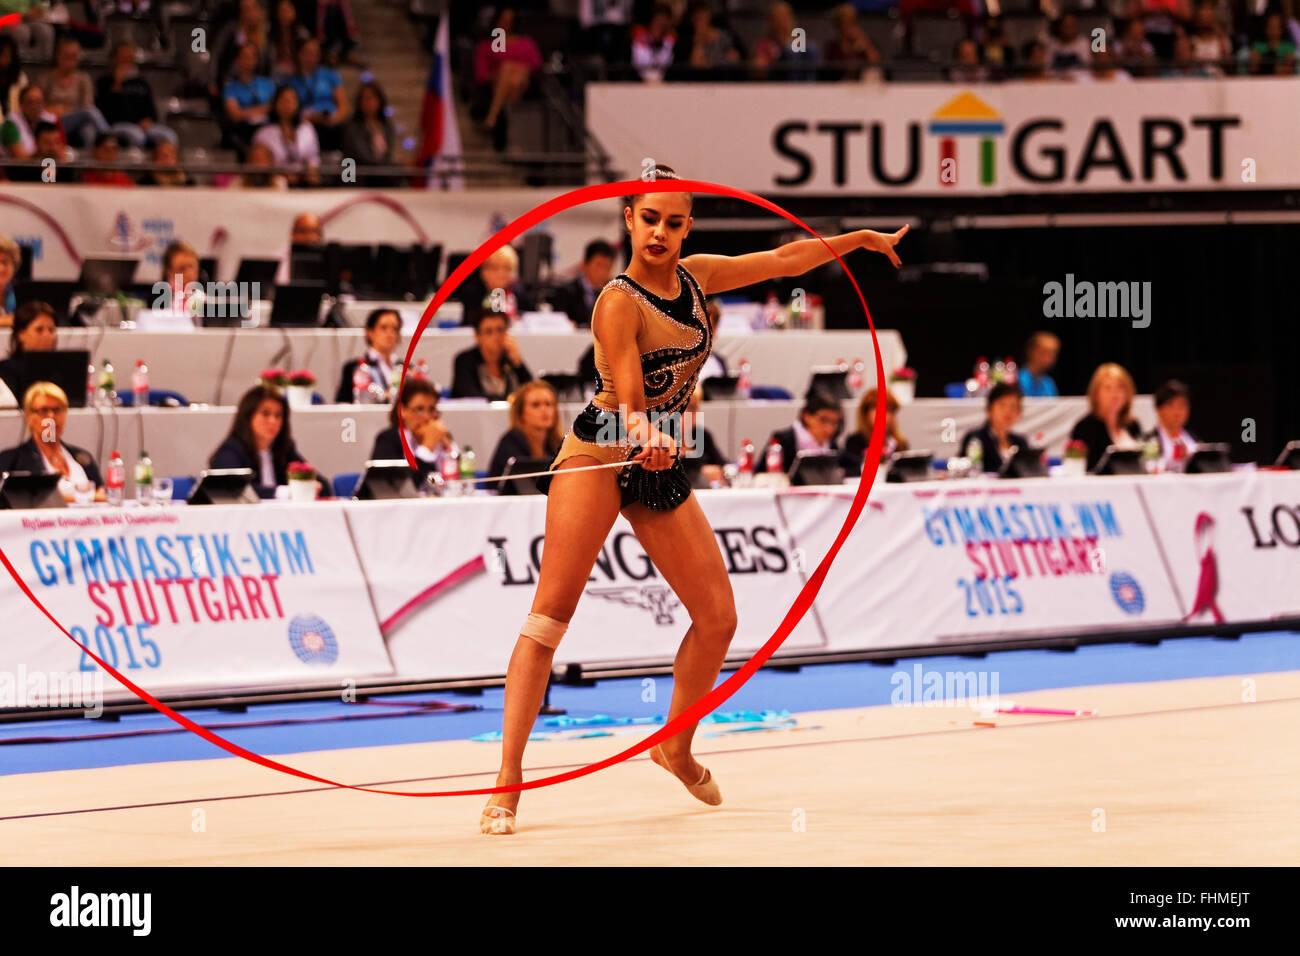 margarita mamun rus rhythmic gymnastics stockfotos margarita mamun rus rhythmic gymnastics. Black Bedroom Furniture Sets. Home Design Ideas